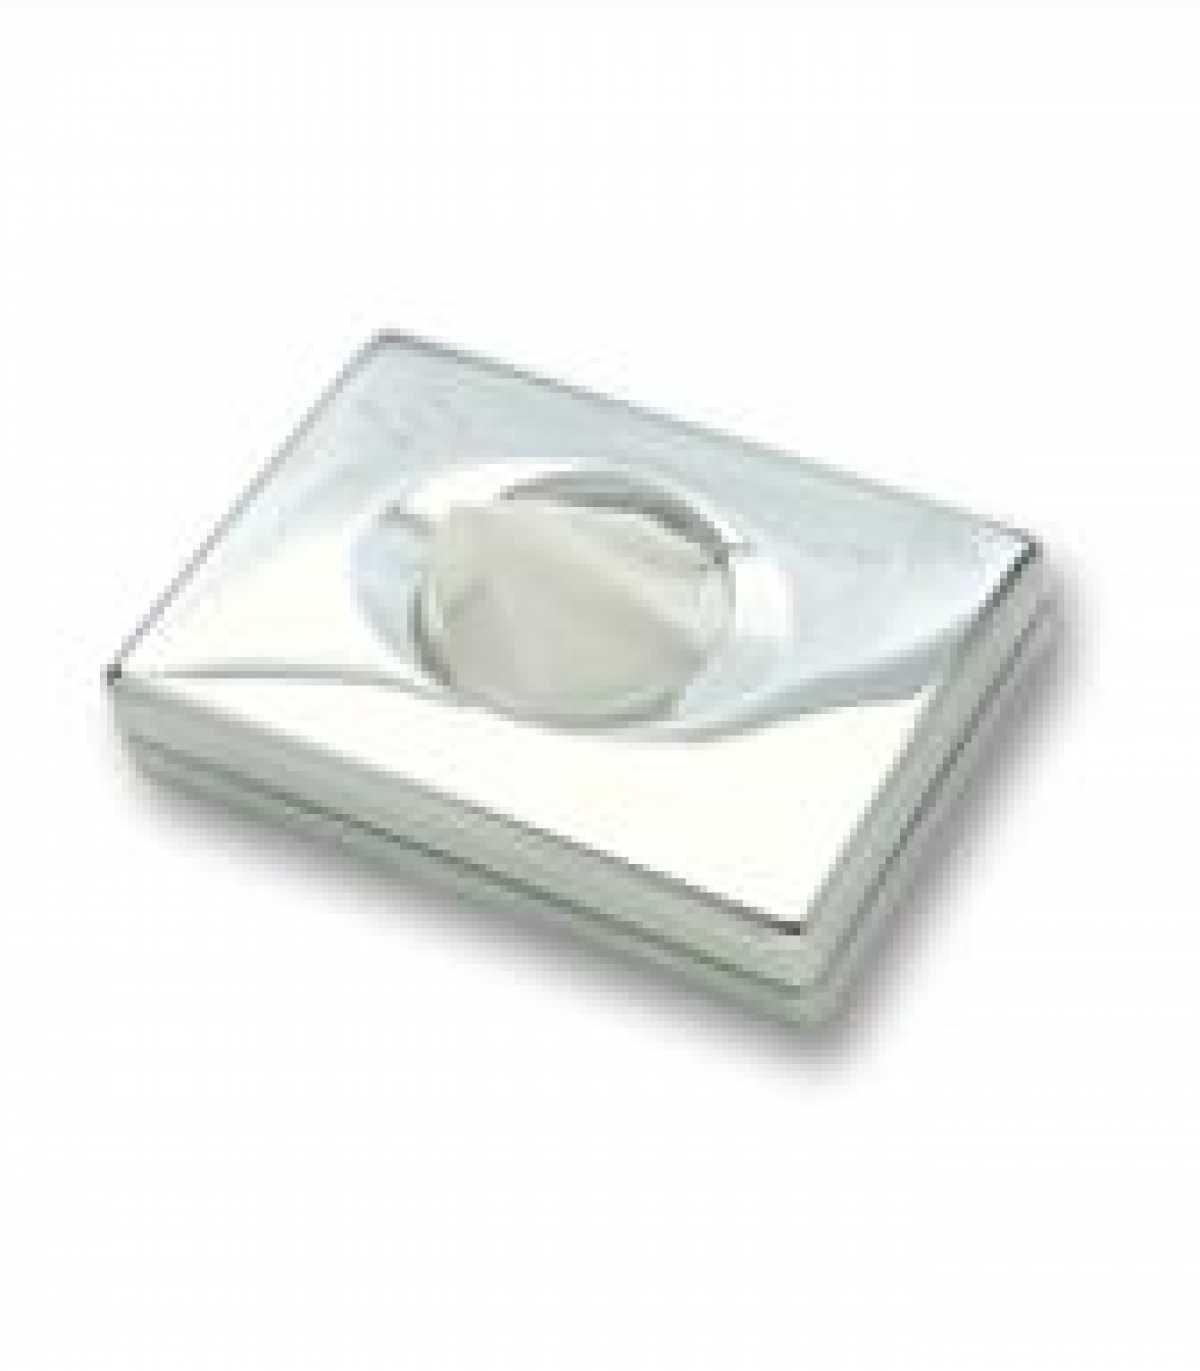 ABS Plastik Hijyen Poşet Dispenseri, Krom